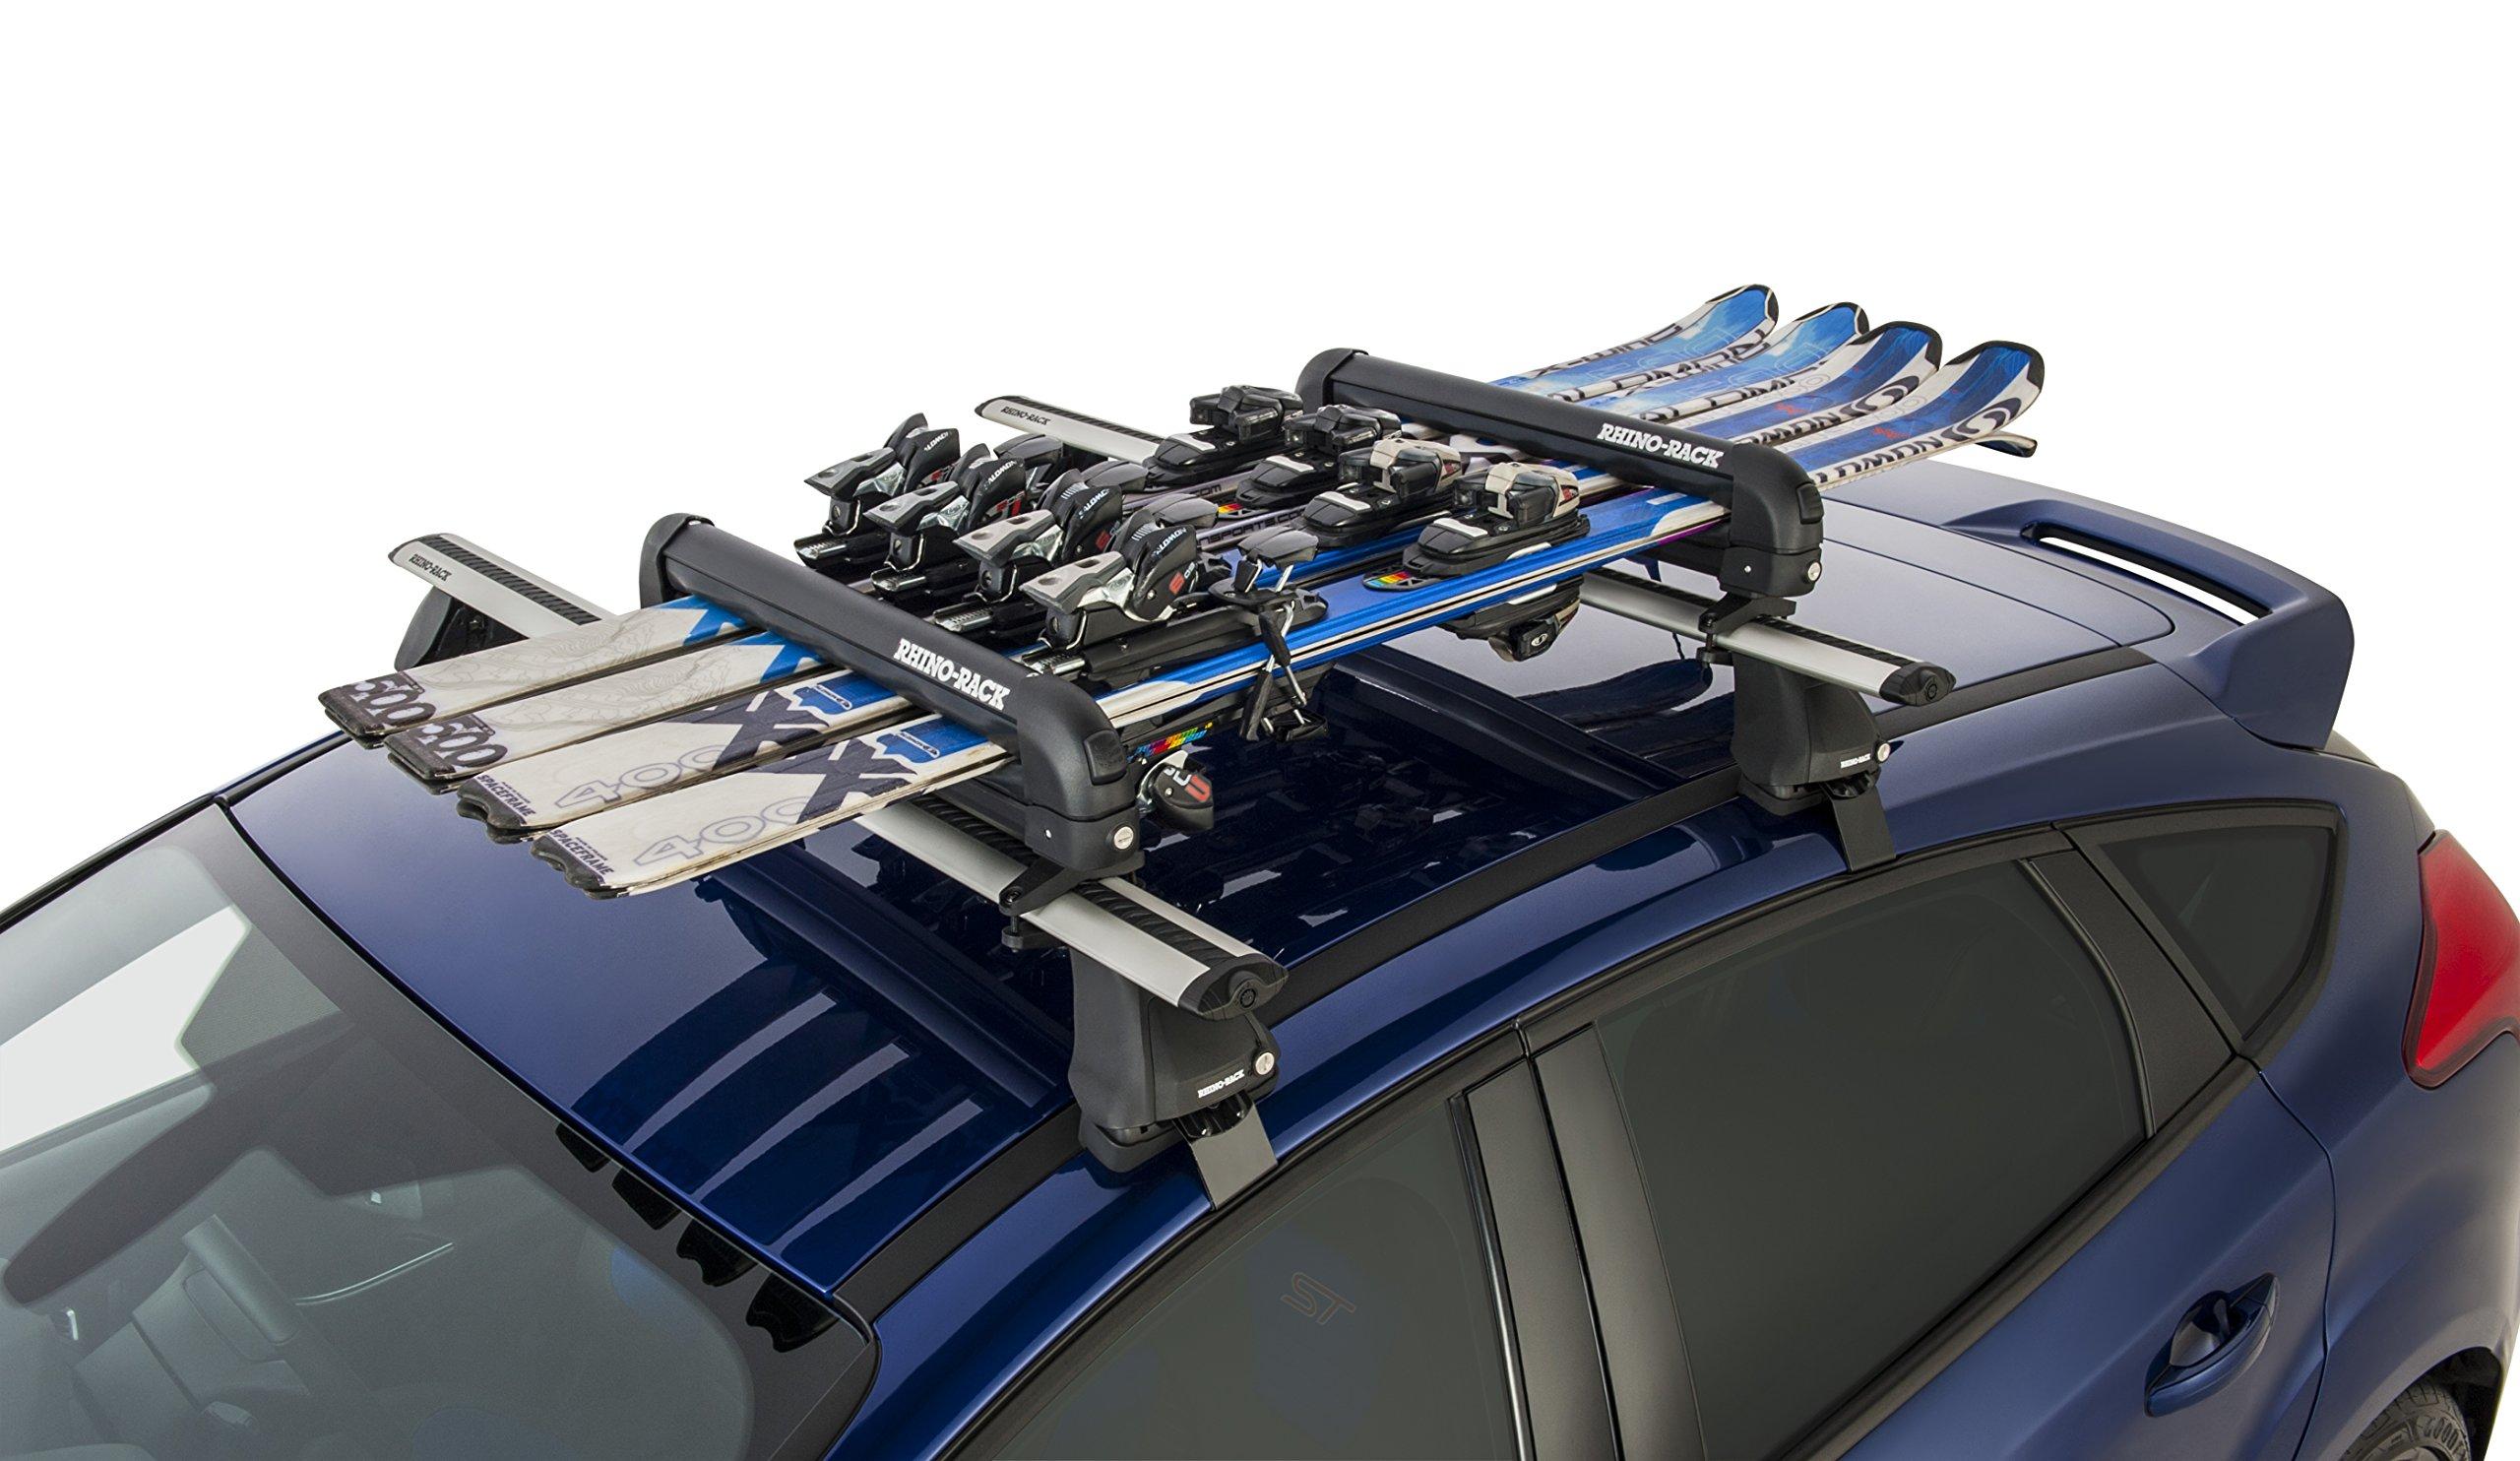 Rhino Rack 574 Ski and Snowboard Carrier - 4 Skis or 2 Snowboards | 574 by Rhino Rack (Image #7)